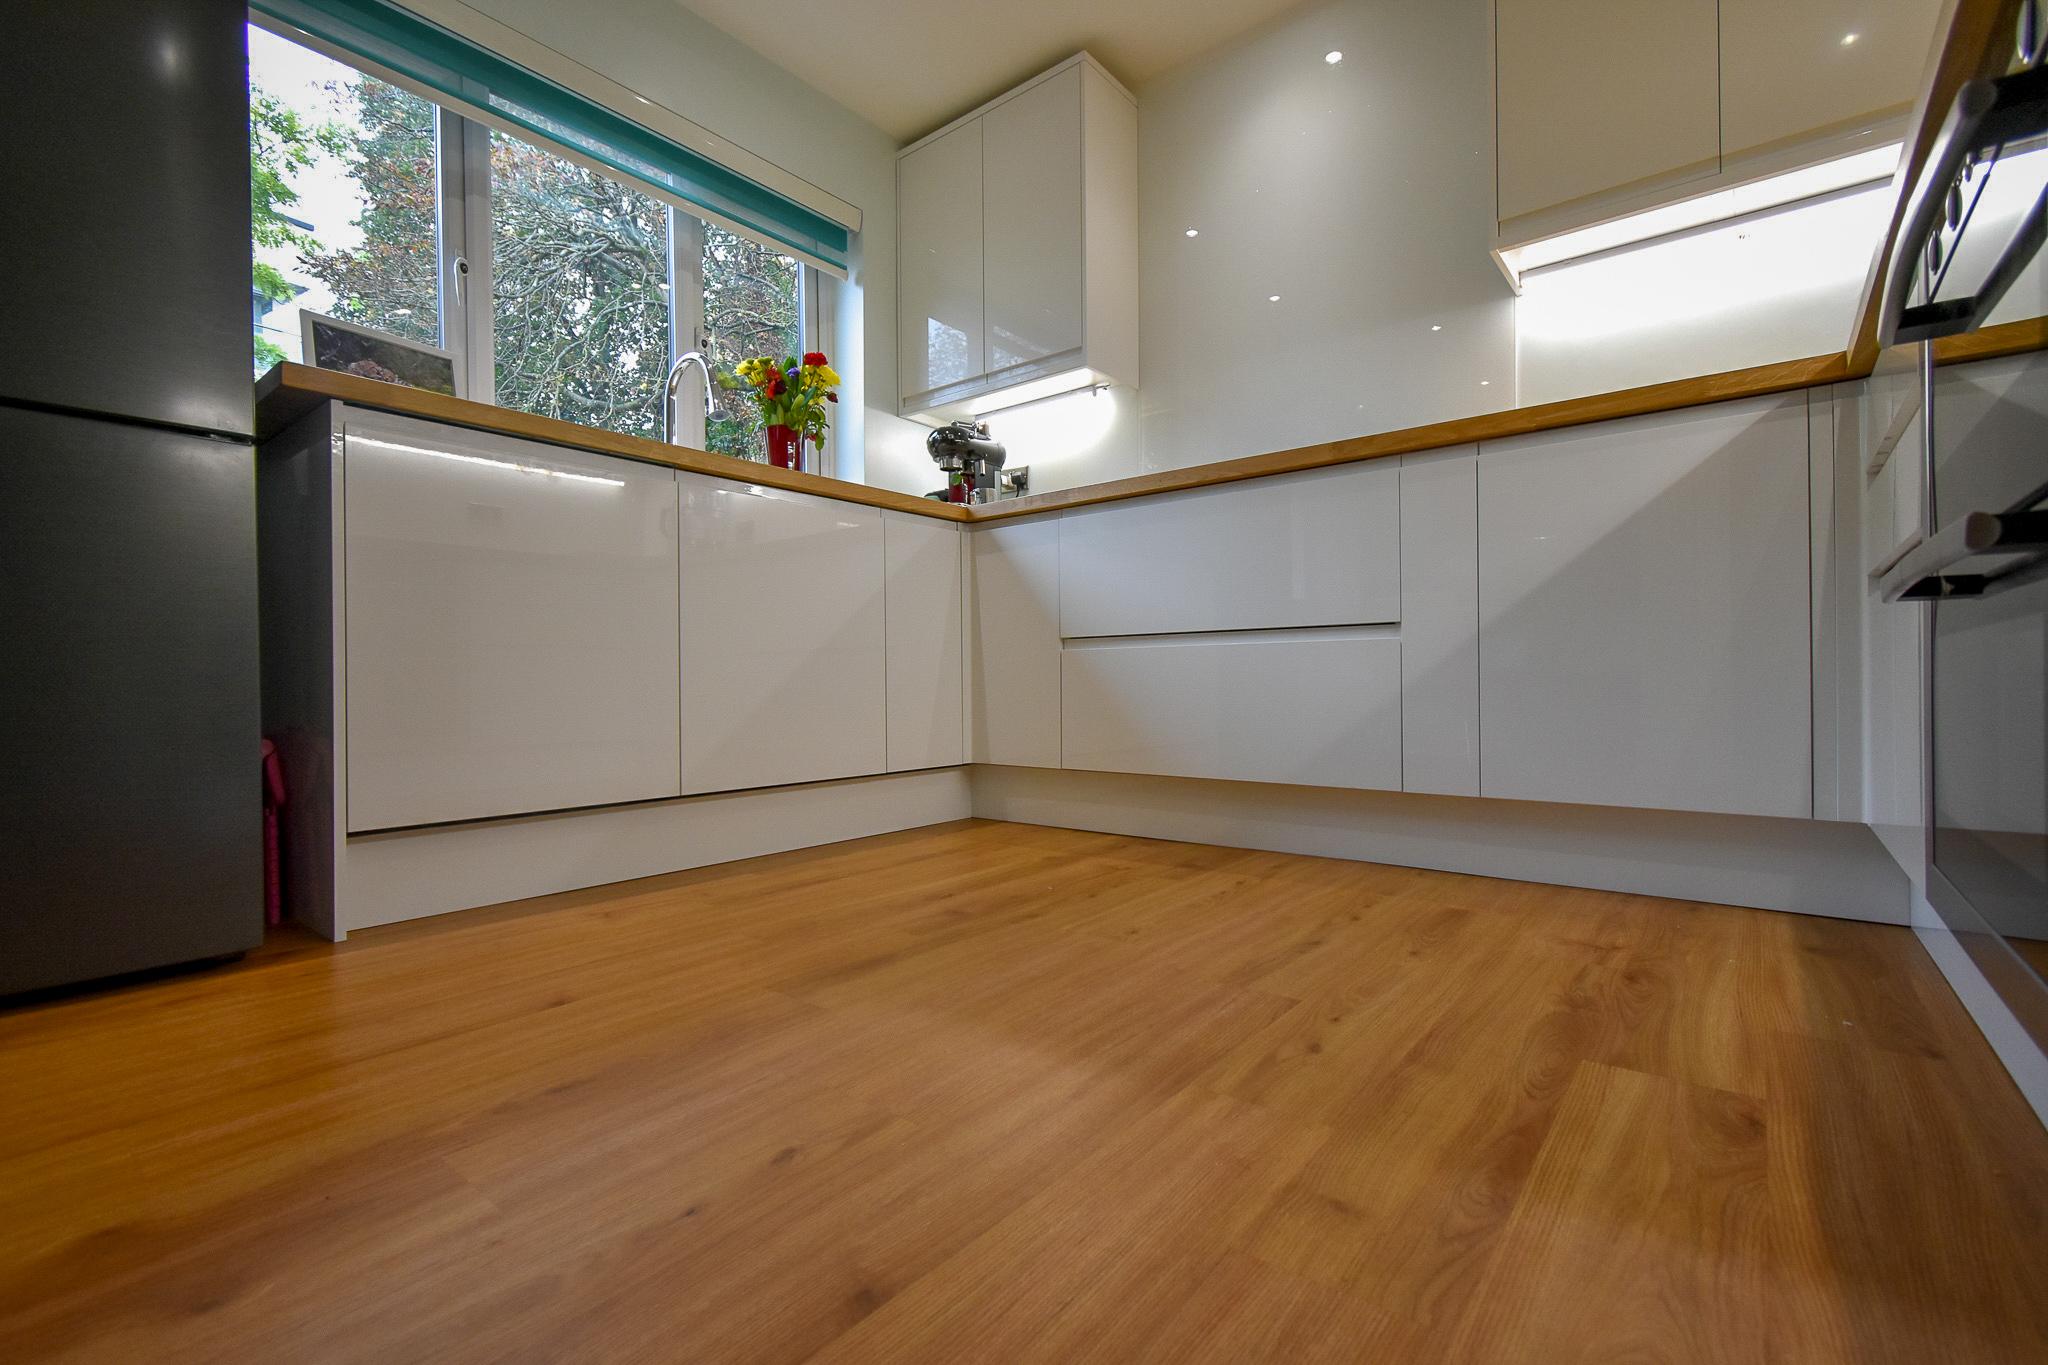 Oak kardean flooring